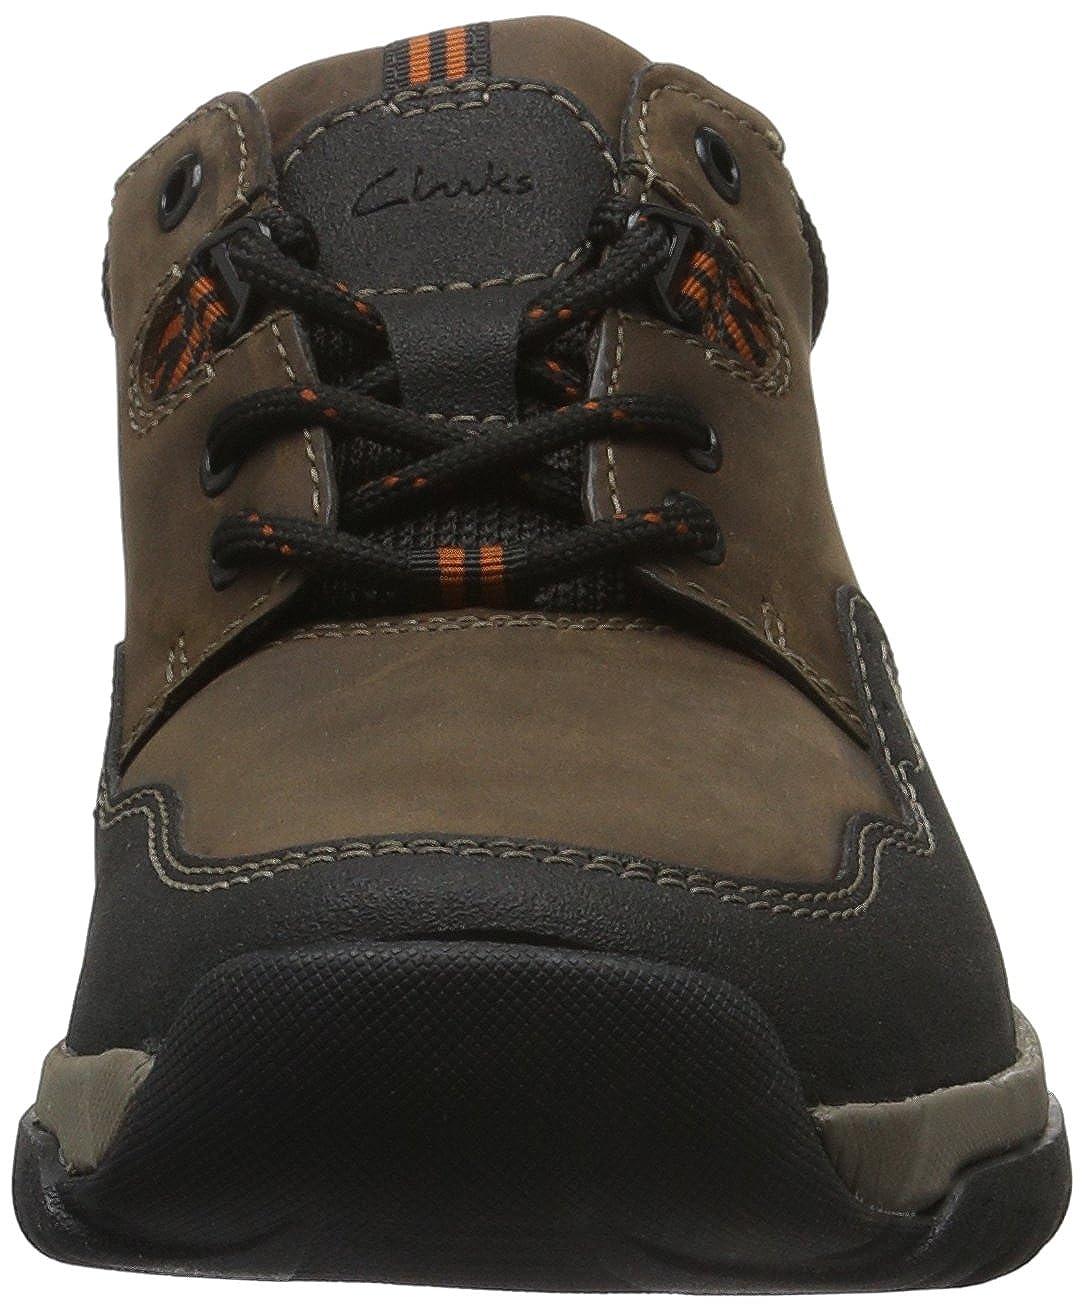 Edge Walbeck Walbeck Clarks Sneaker Clarks Edge Herren Herren Herren Walbeck Sneaker Clarks WIY9EDH2